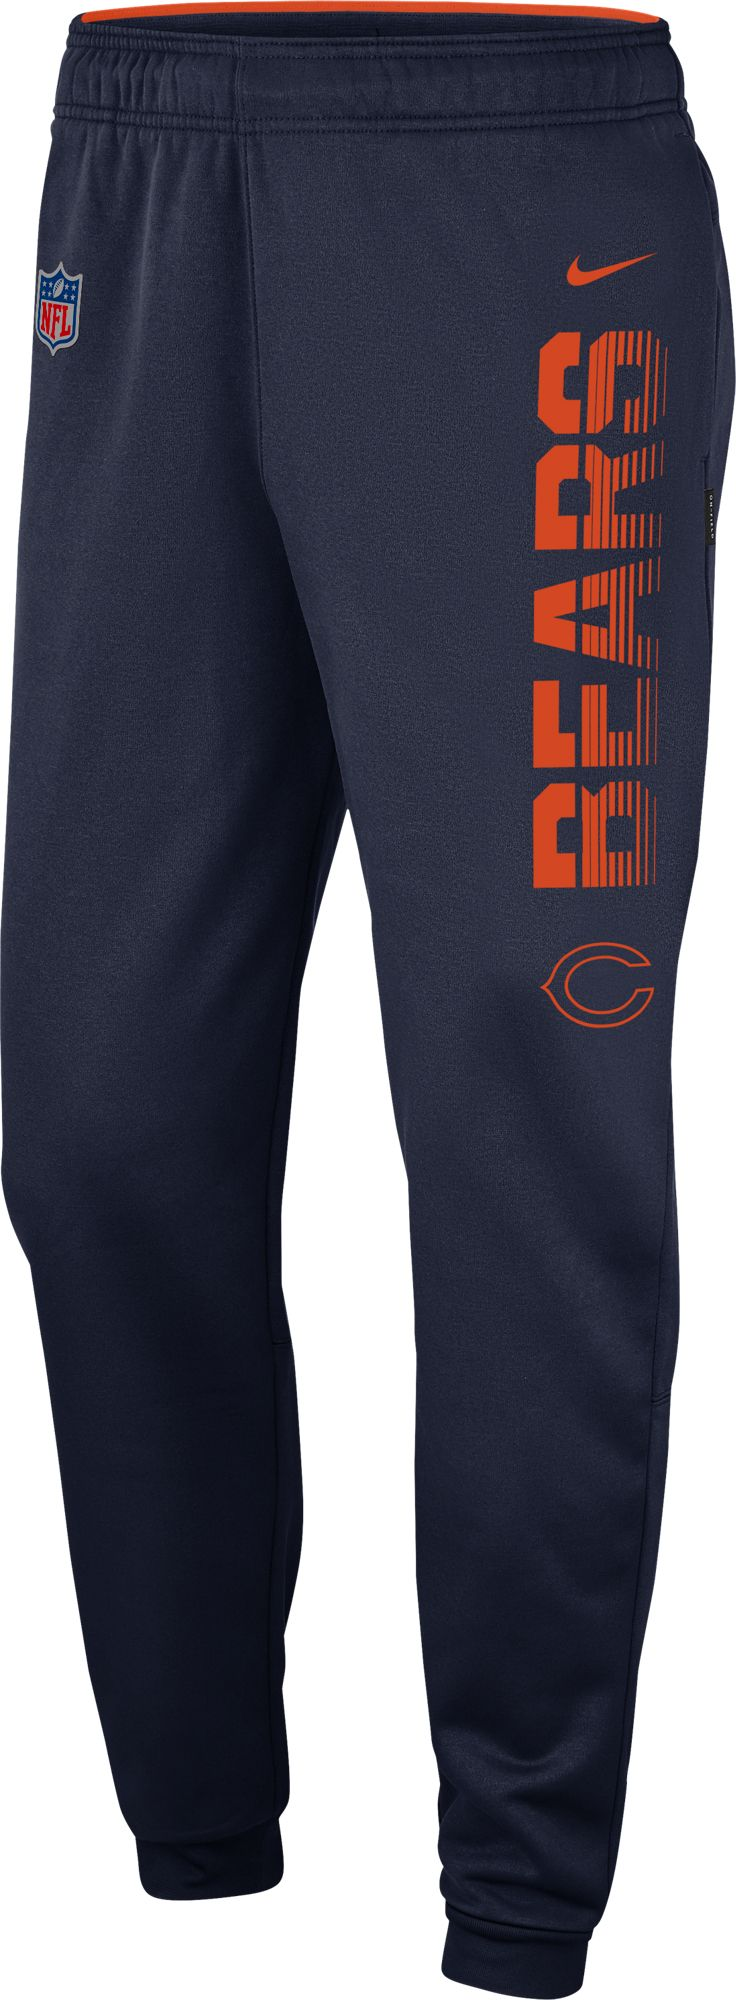 chicago bears nike shirt